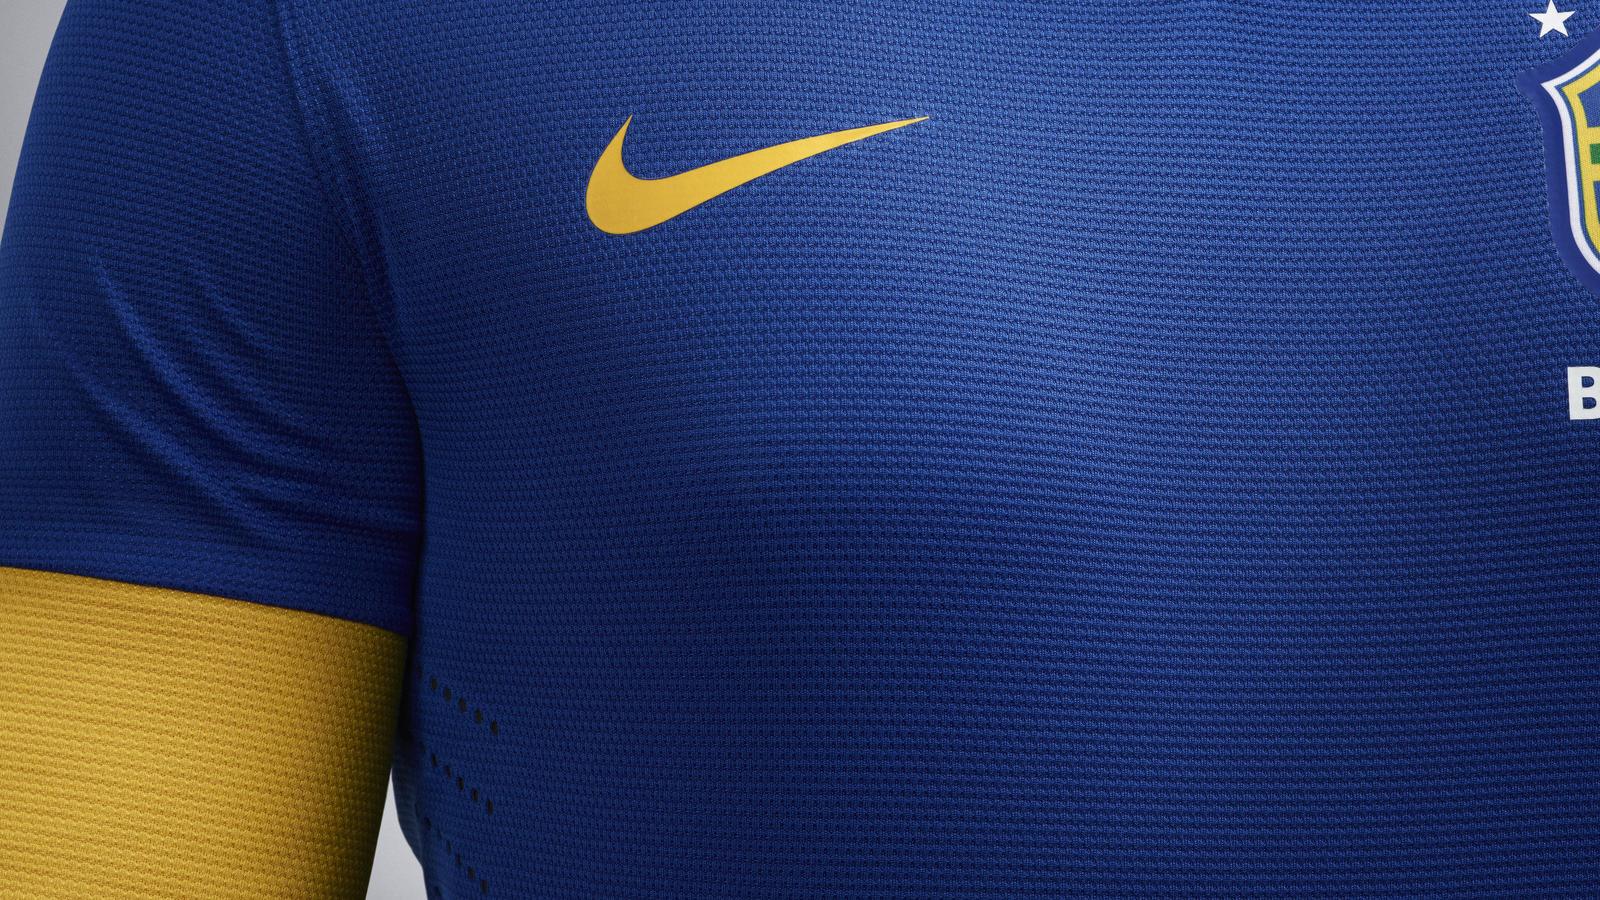 EC12_Brasil_Uniform_away_01